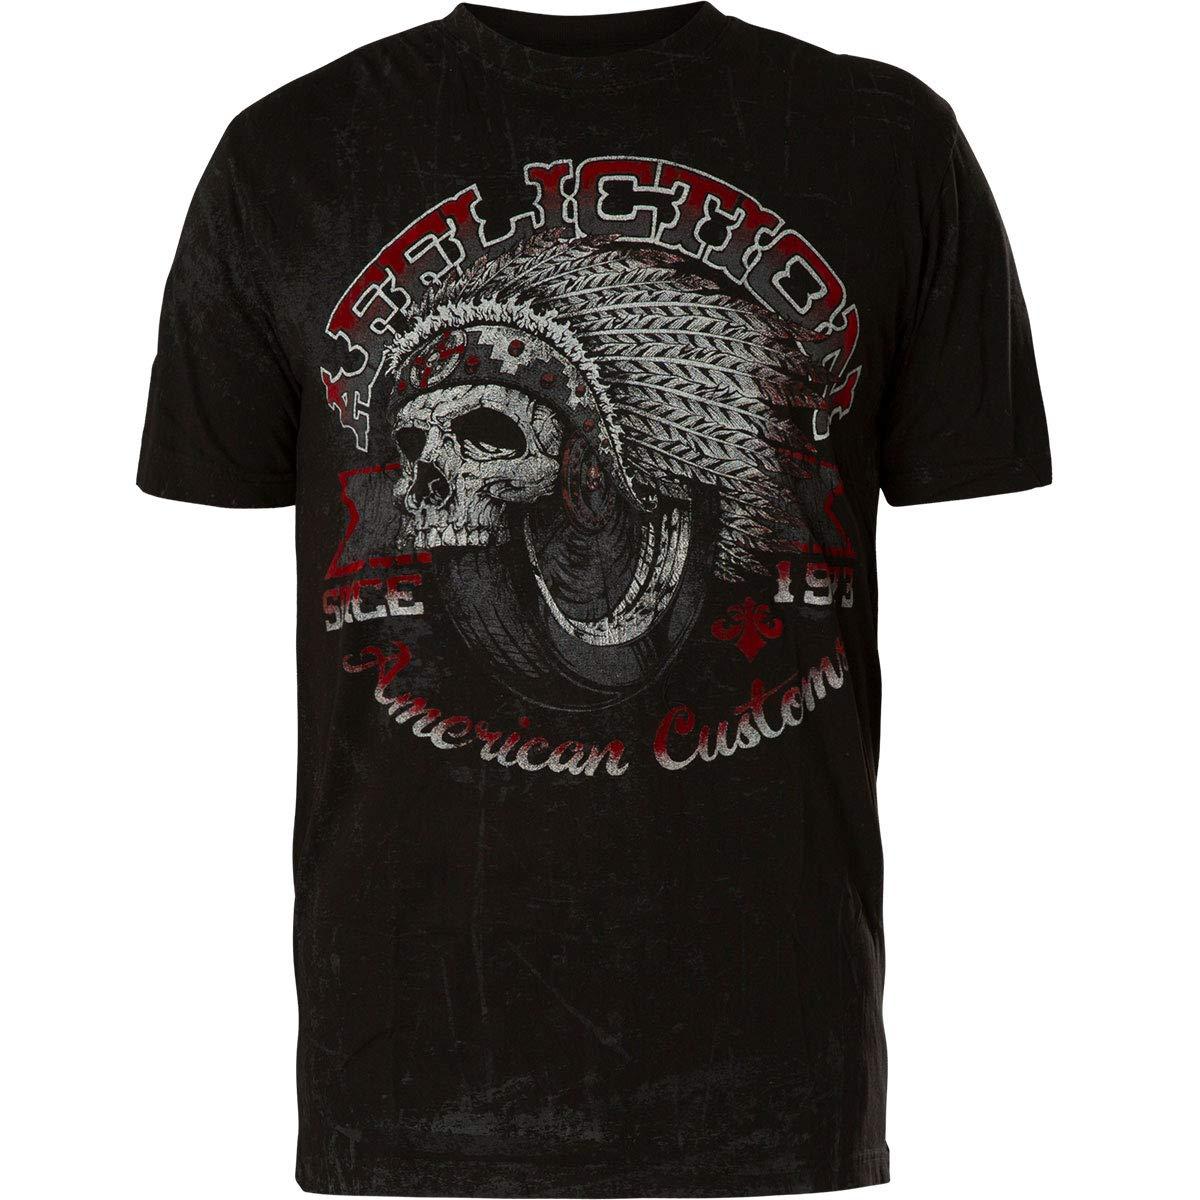 Affliction Men's Graphic T-Shirt, Bull Run Variant, Short Sleeve Crew Neck Shirt